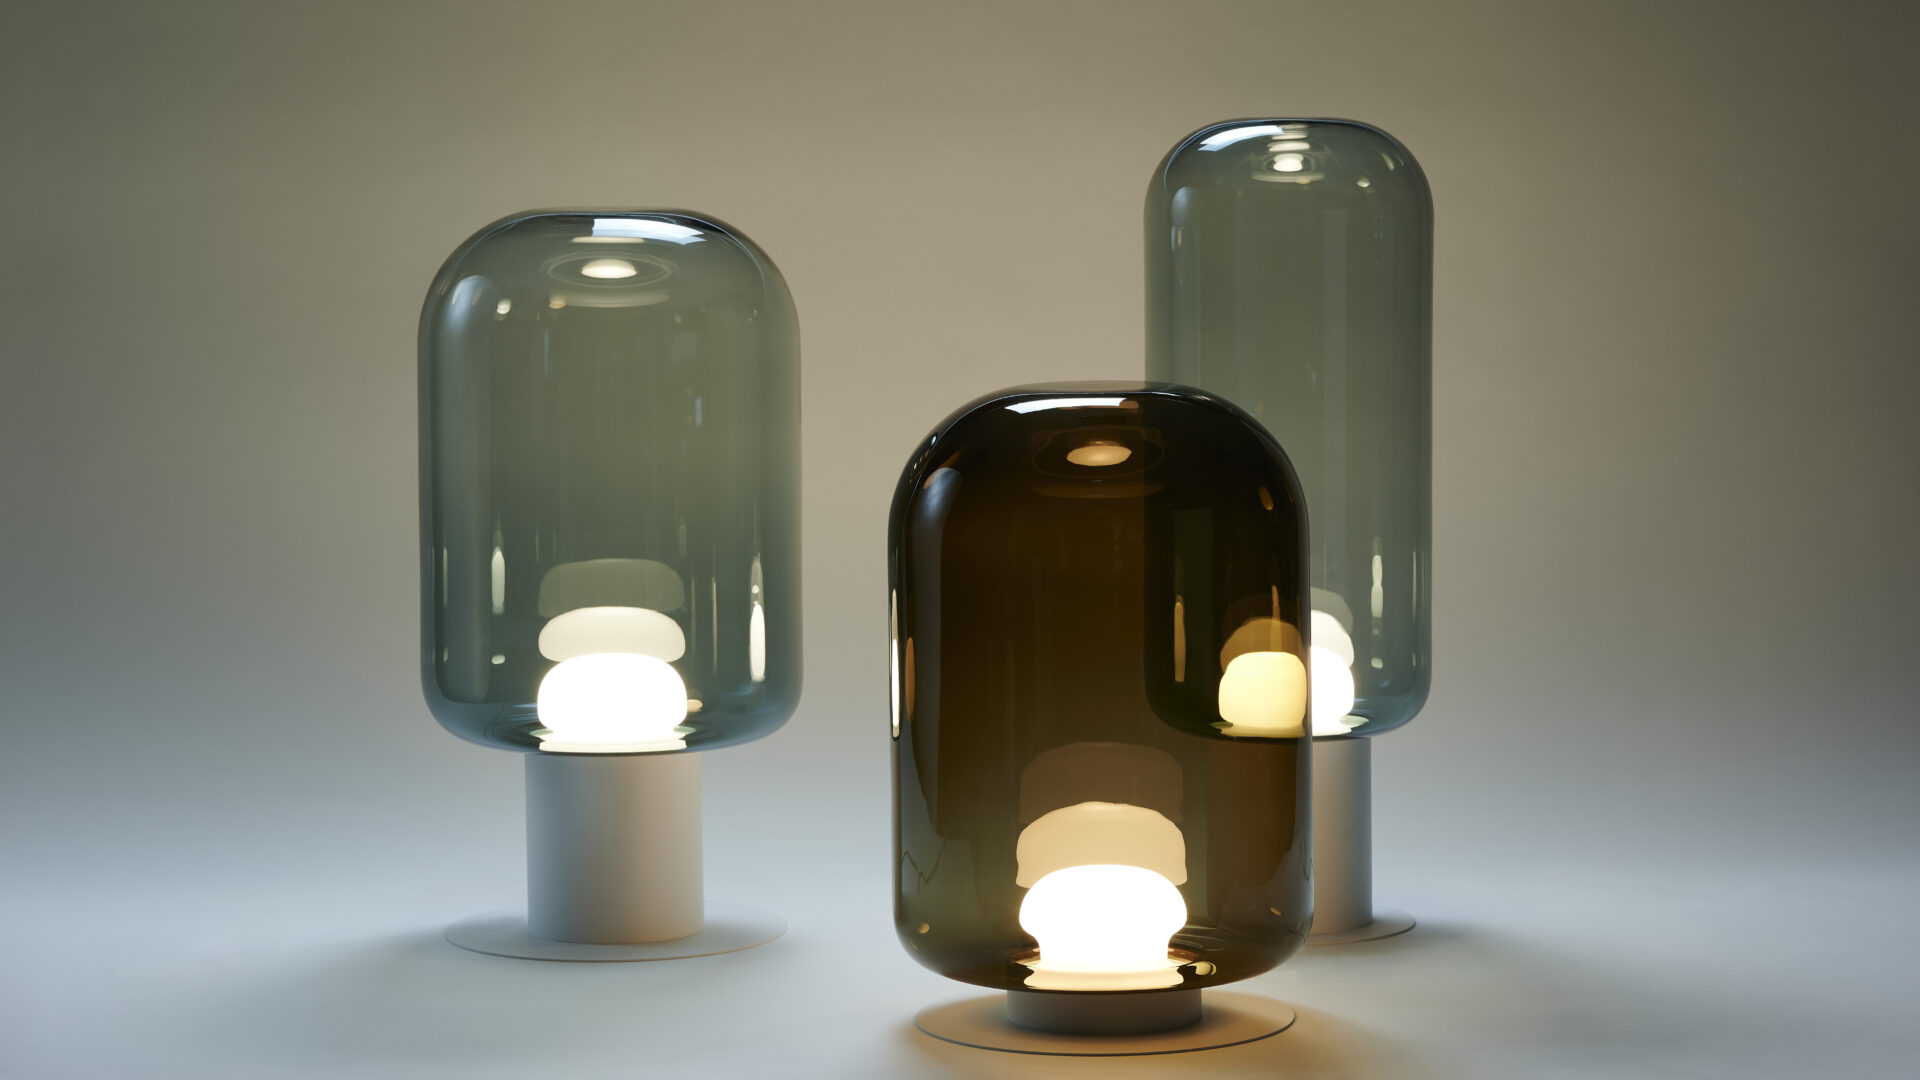 Labra zaprezentowała autorską kolekcję lamp projektu Macieja Karpiaka